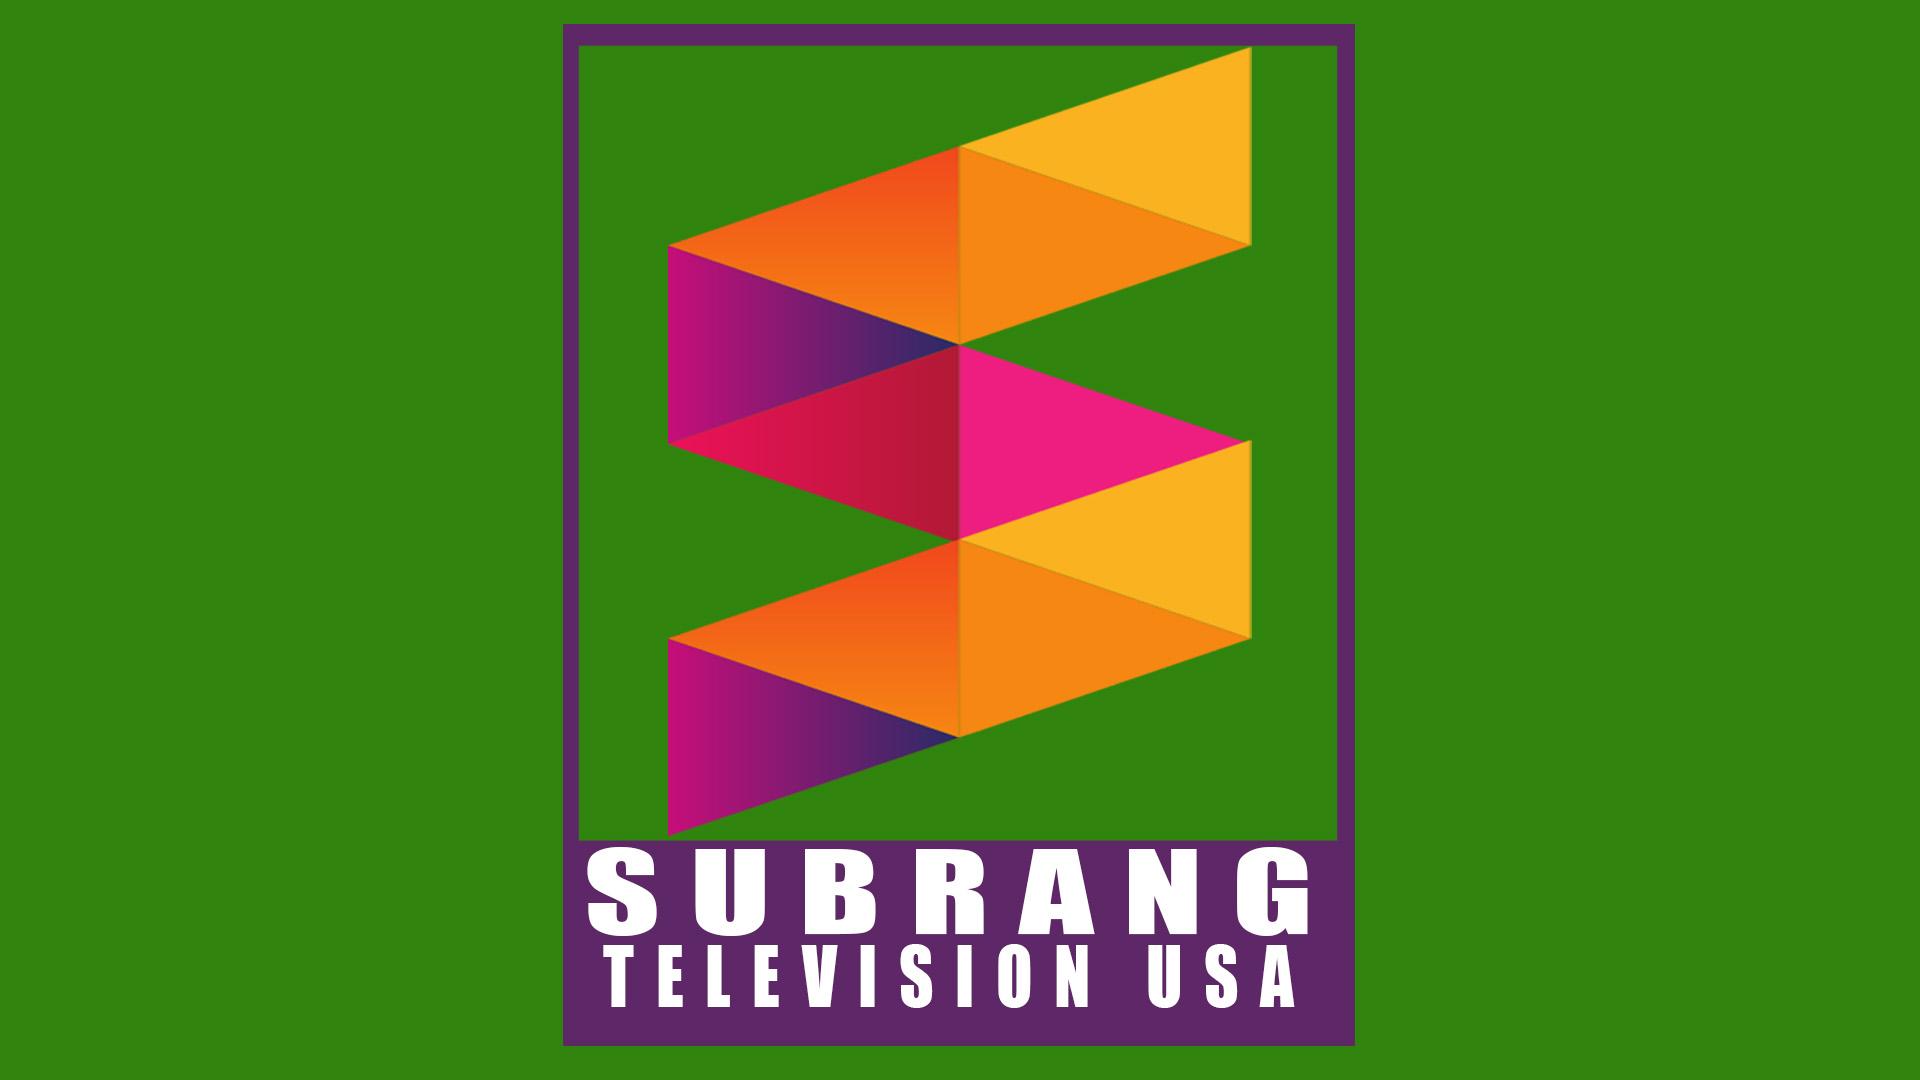 Subrang TV